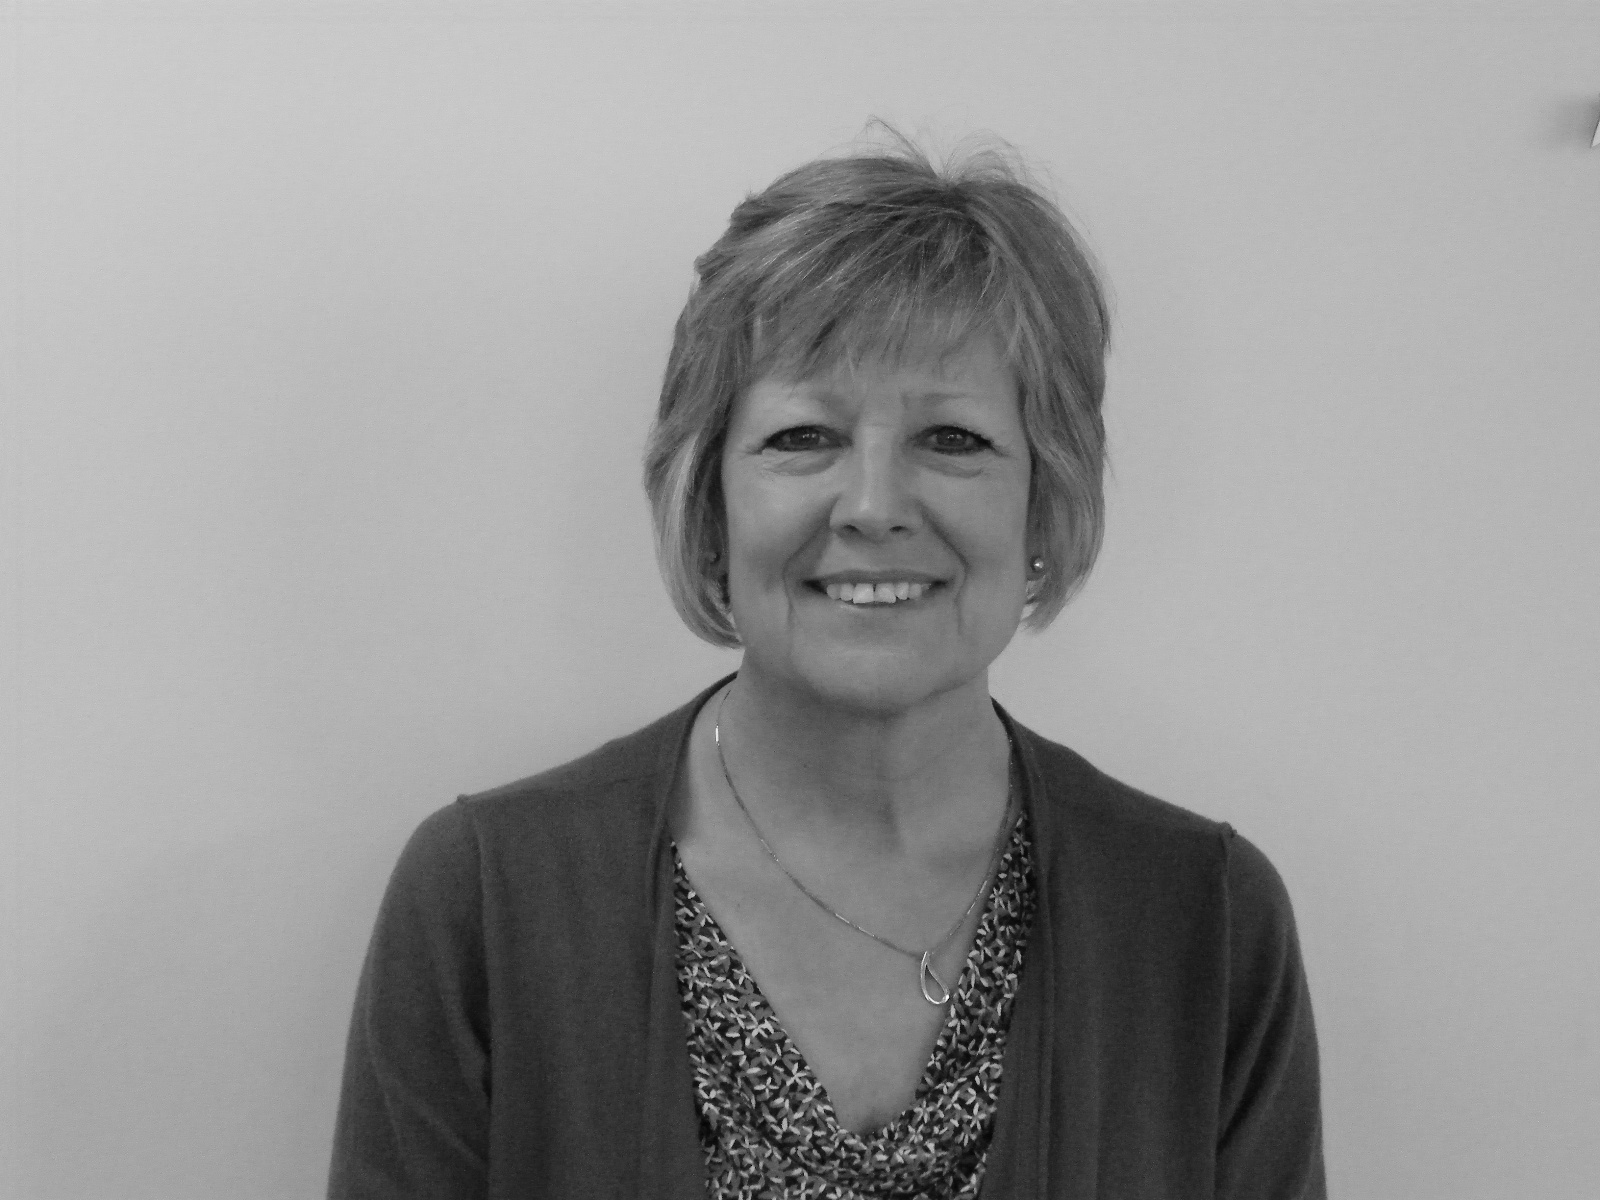 Julie Hartley